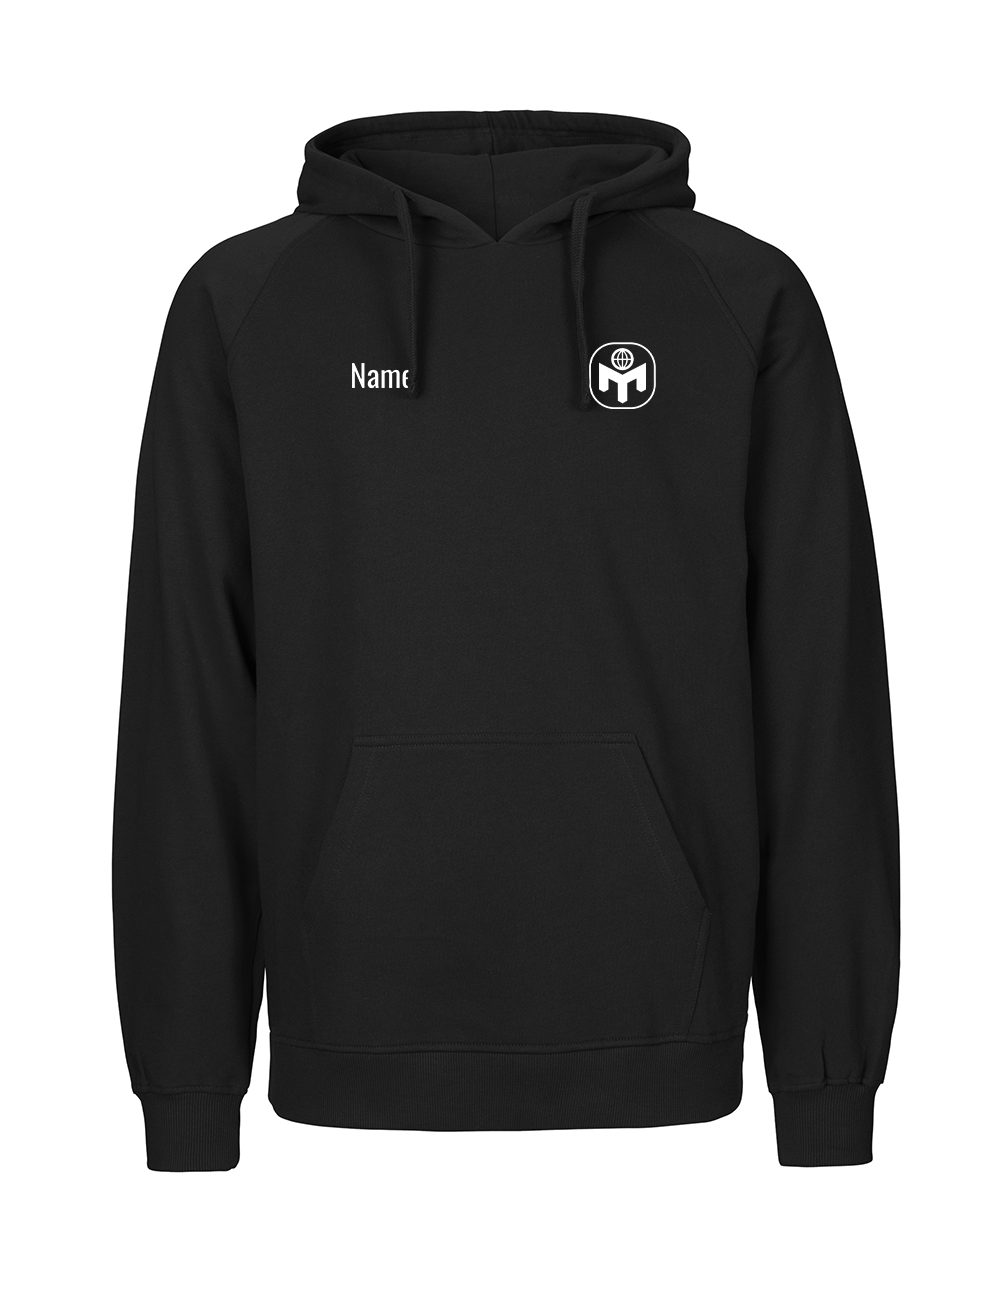 "Hoodie Herren ""Mblem"" Premium"